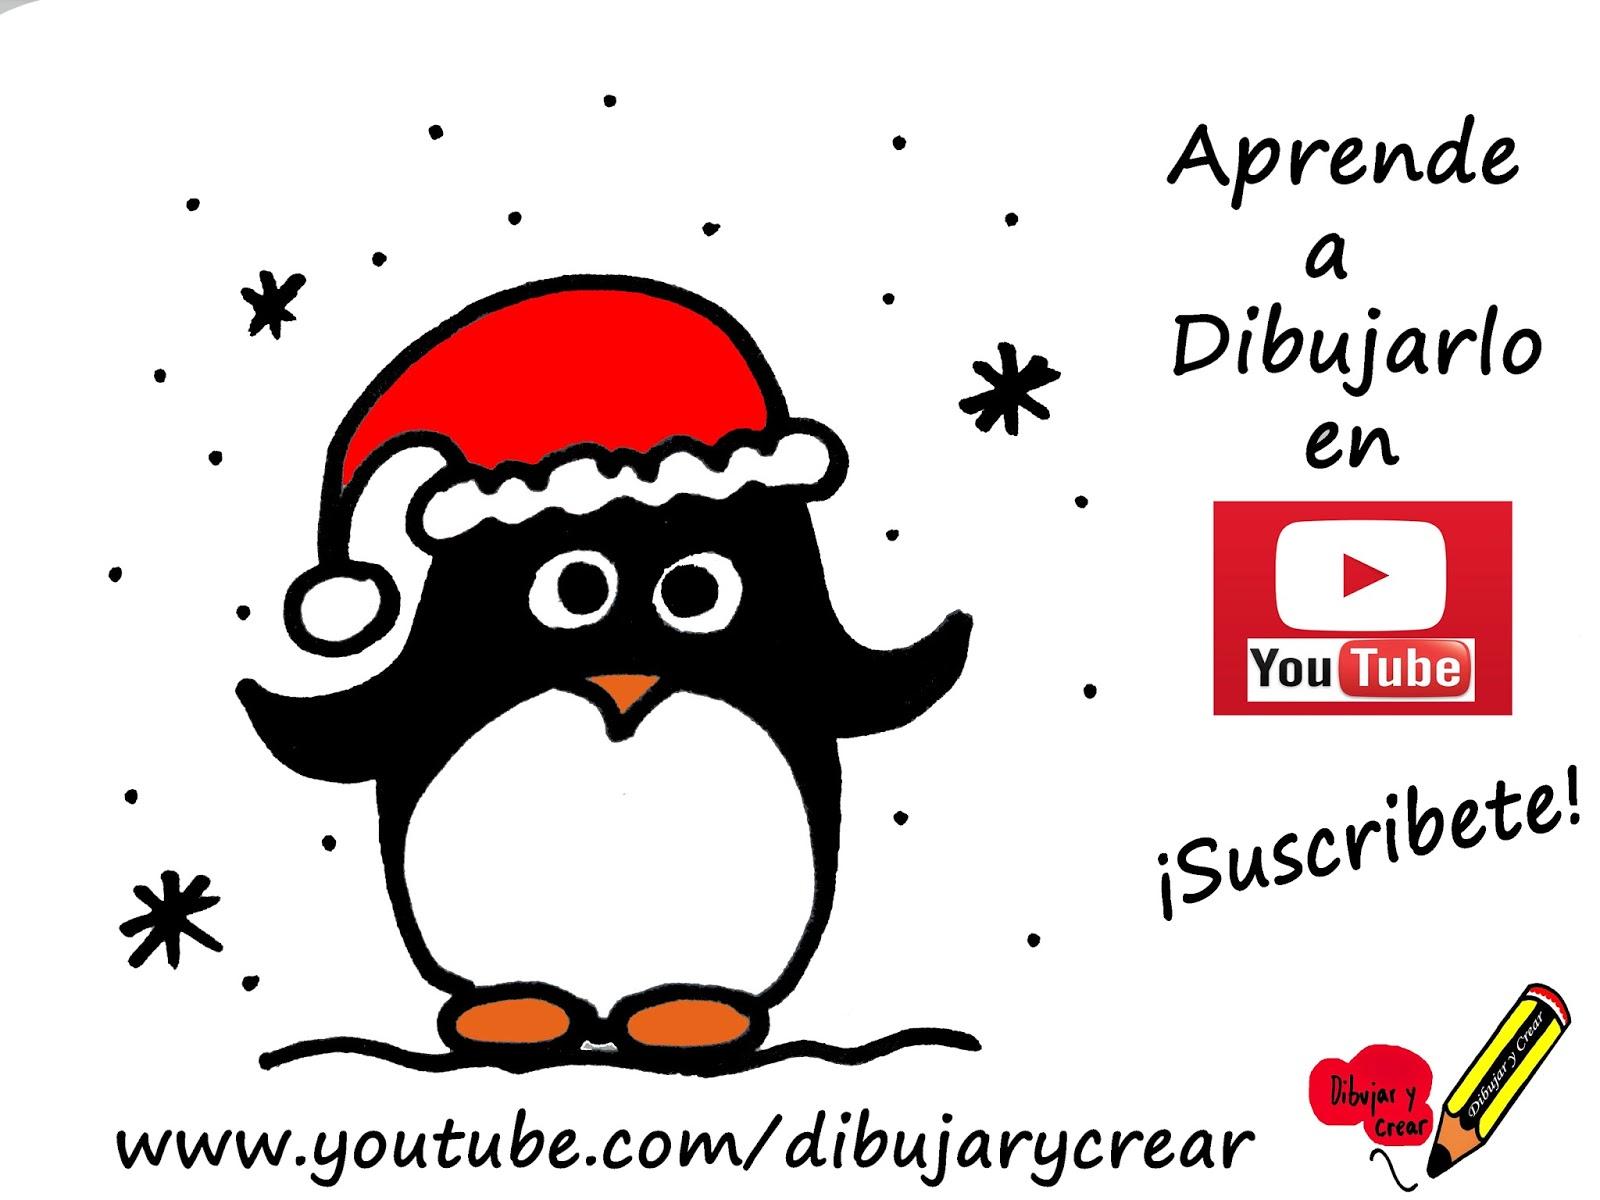 Dibujar Y Crear Como Dibujar Un Pinguino Navideño